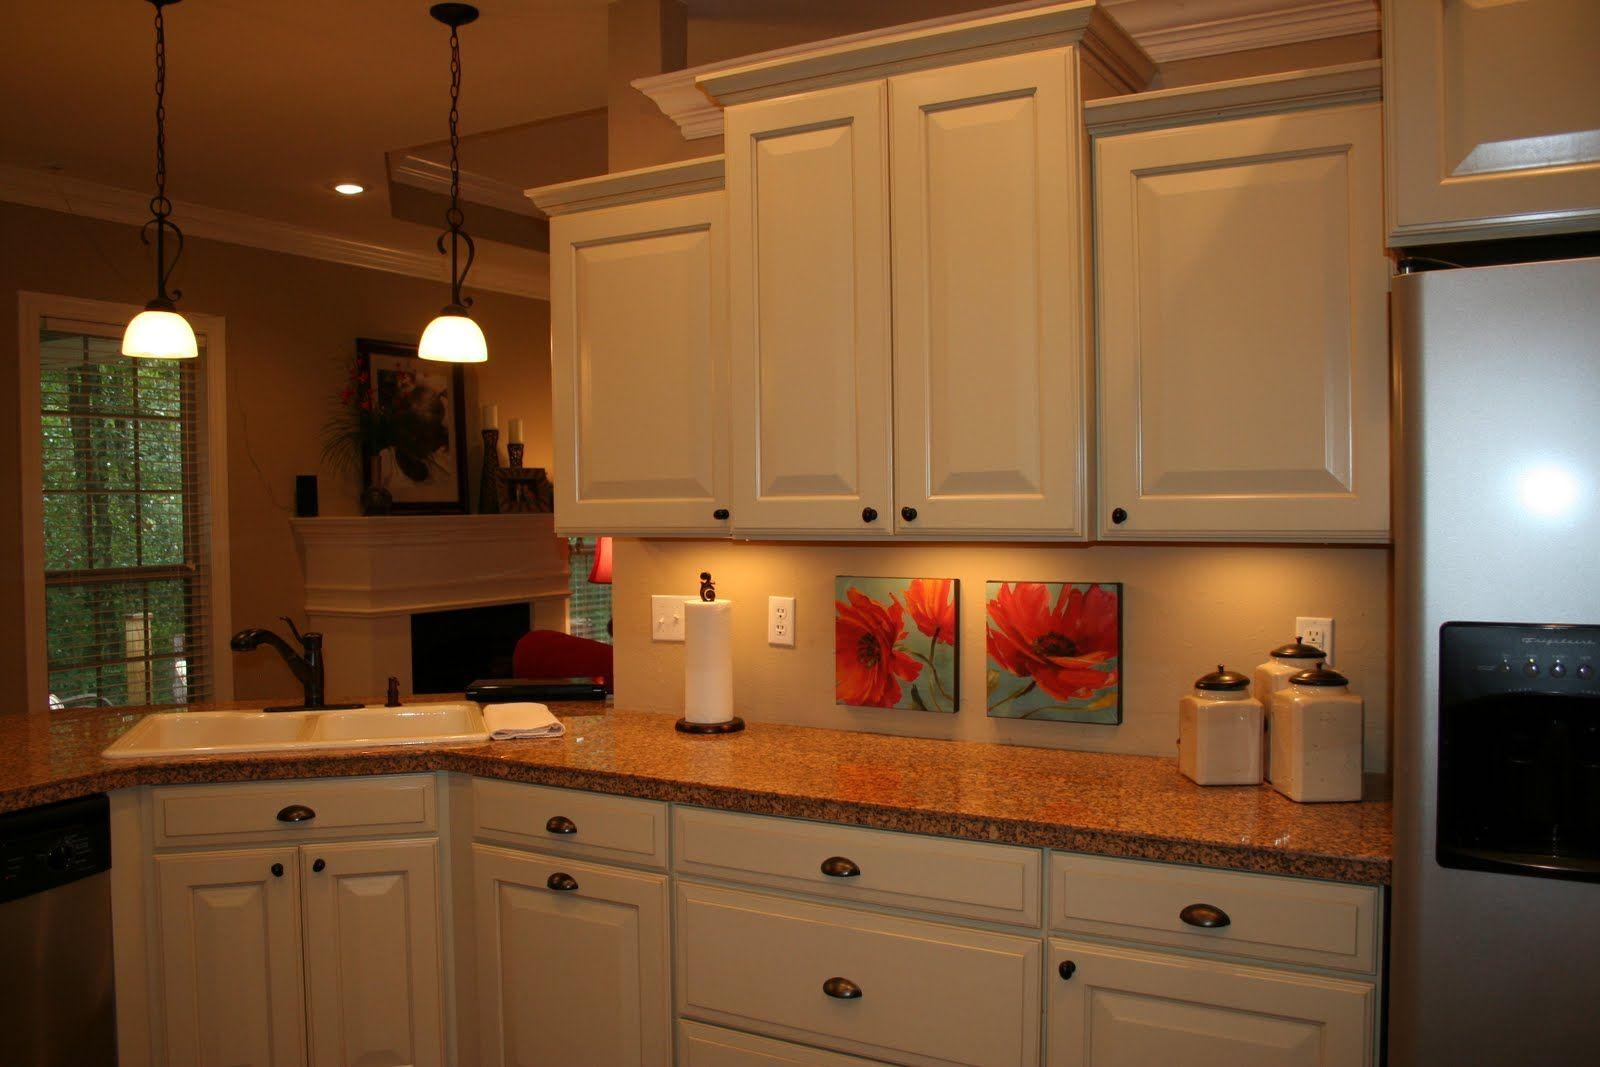 kitchen cabinets cream color   Kitchen, Kitchen cabinets